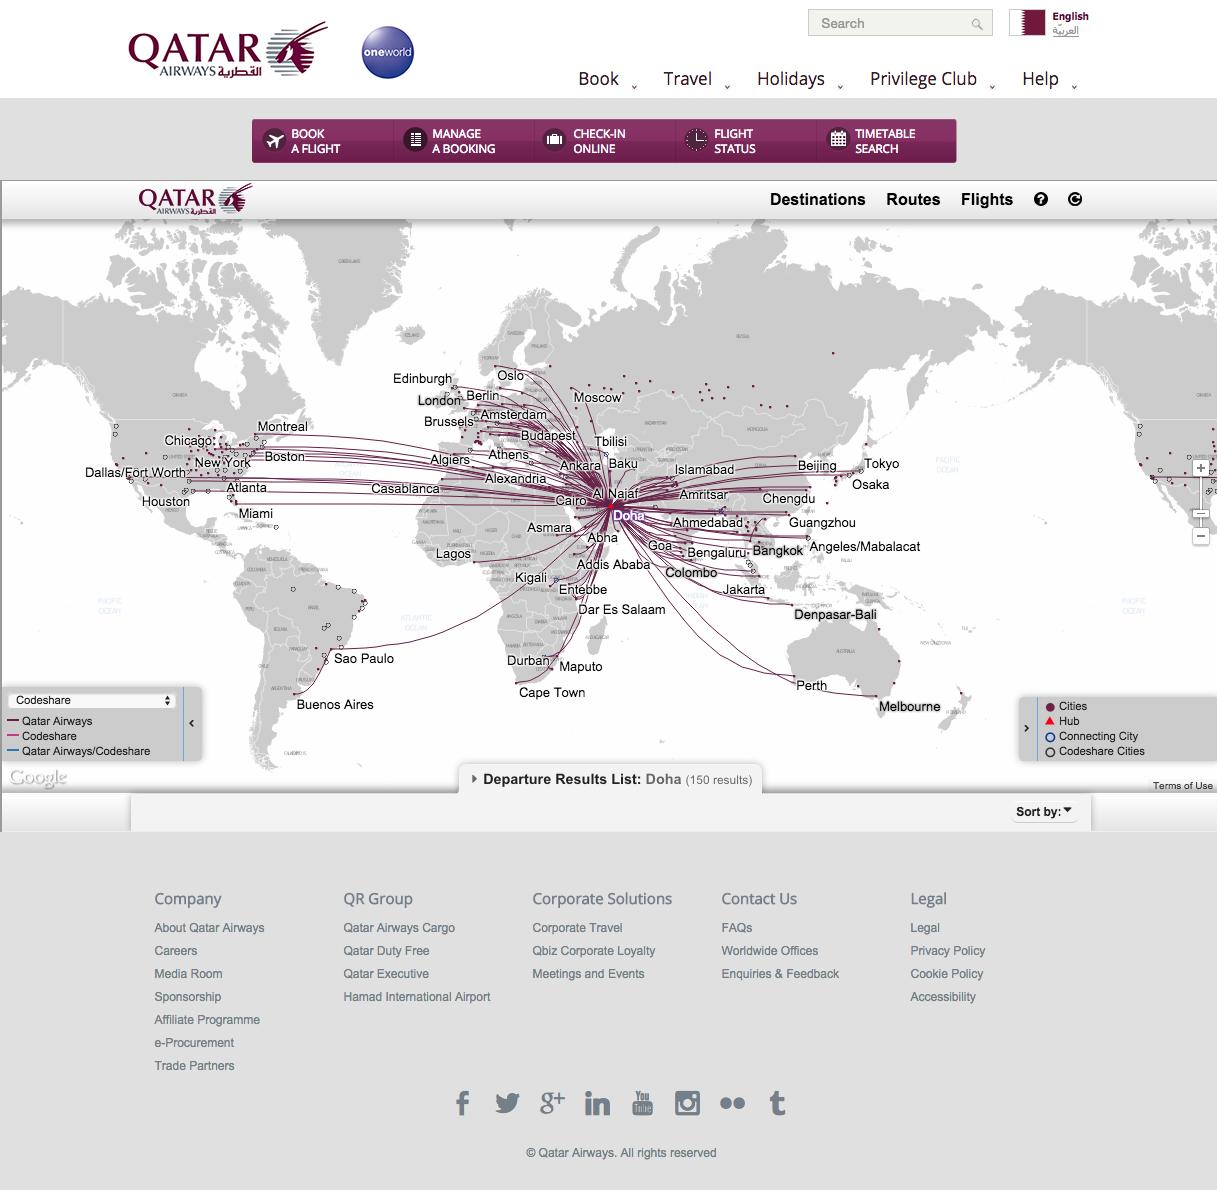 http://www.qatarairways.com/global/en/route-map.page   Destination ...